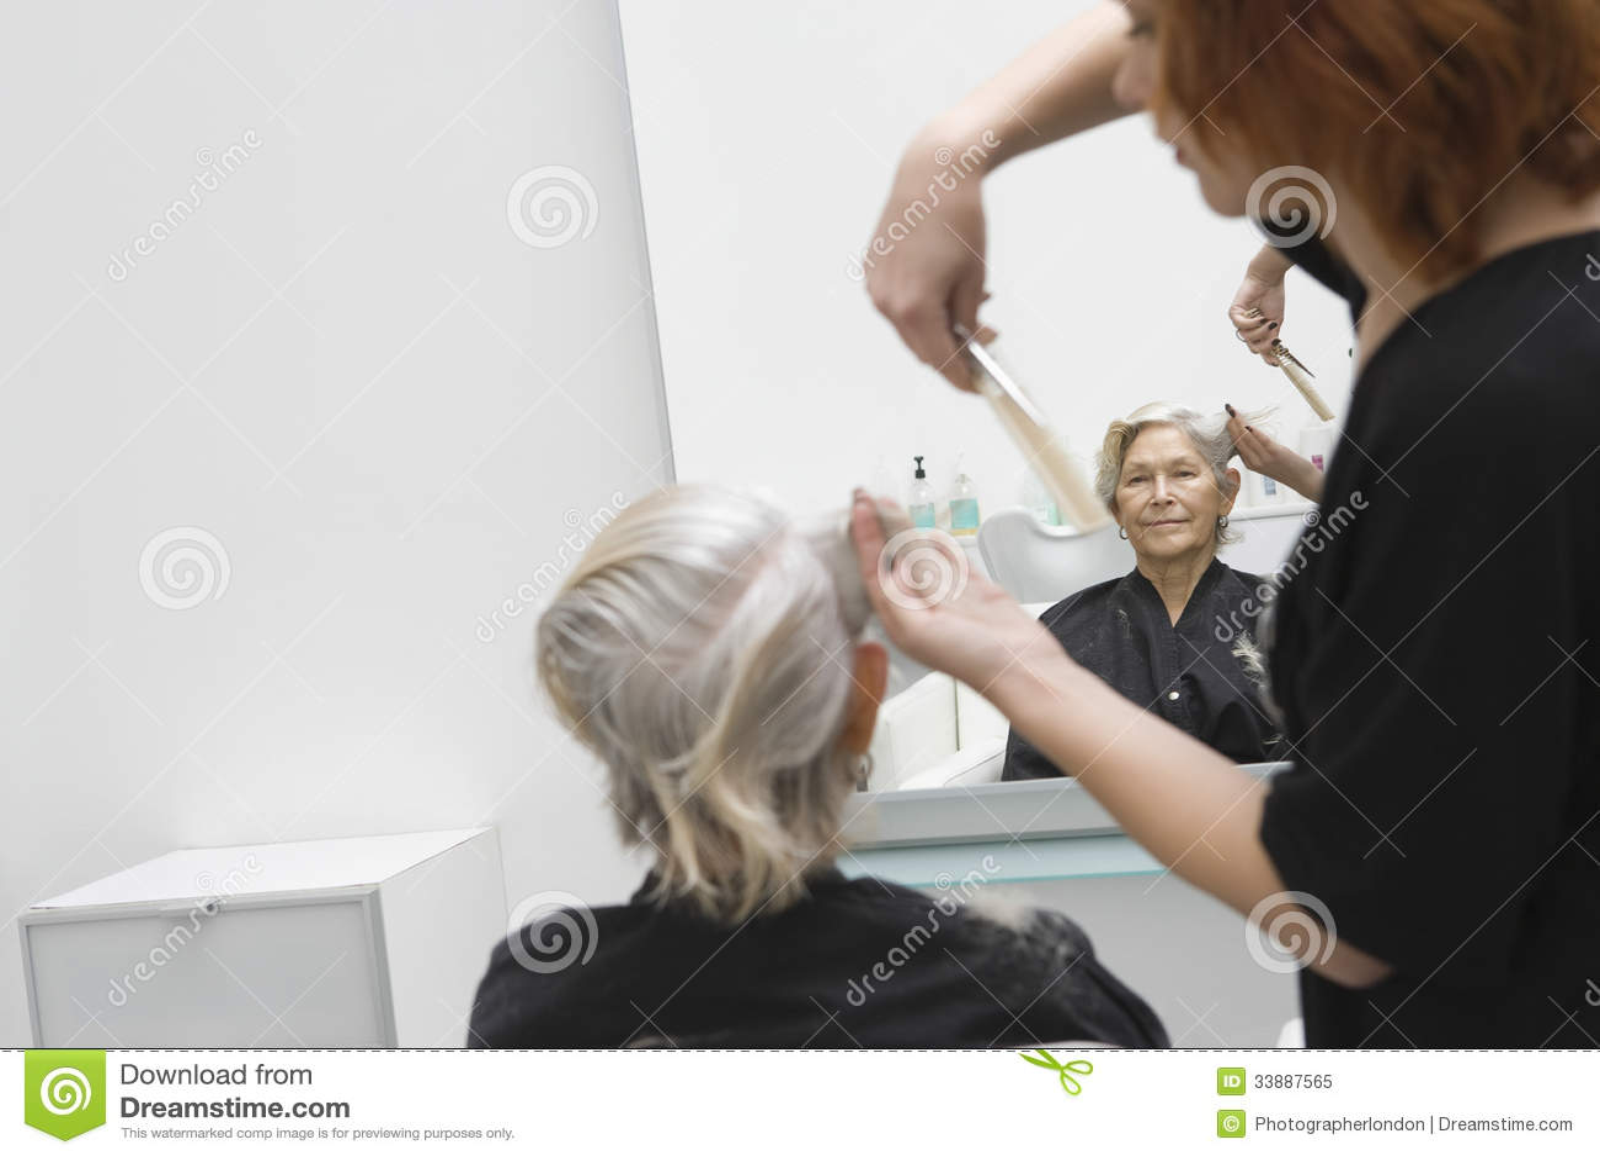 Senior Woman Getting Haircut In Salon Royalty Free Stock Photo - Image ...